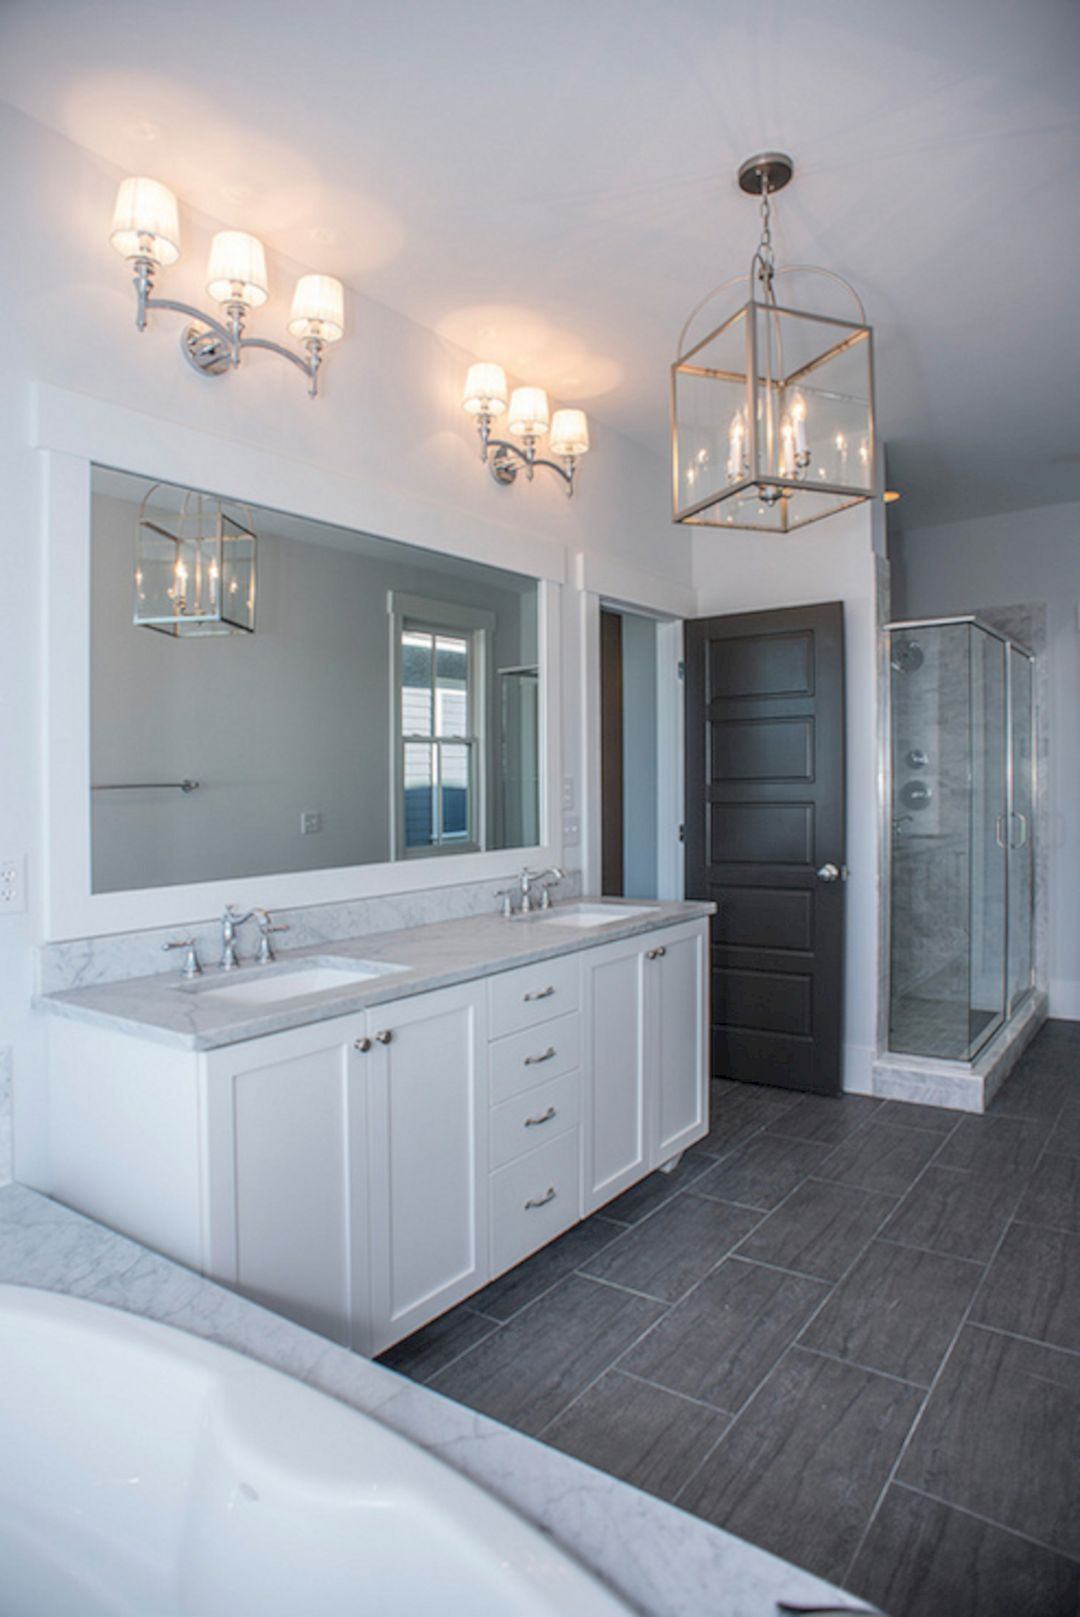 Elegant White Bathroom Vanity Ideas 55+Most Beautiful